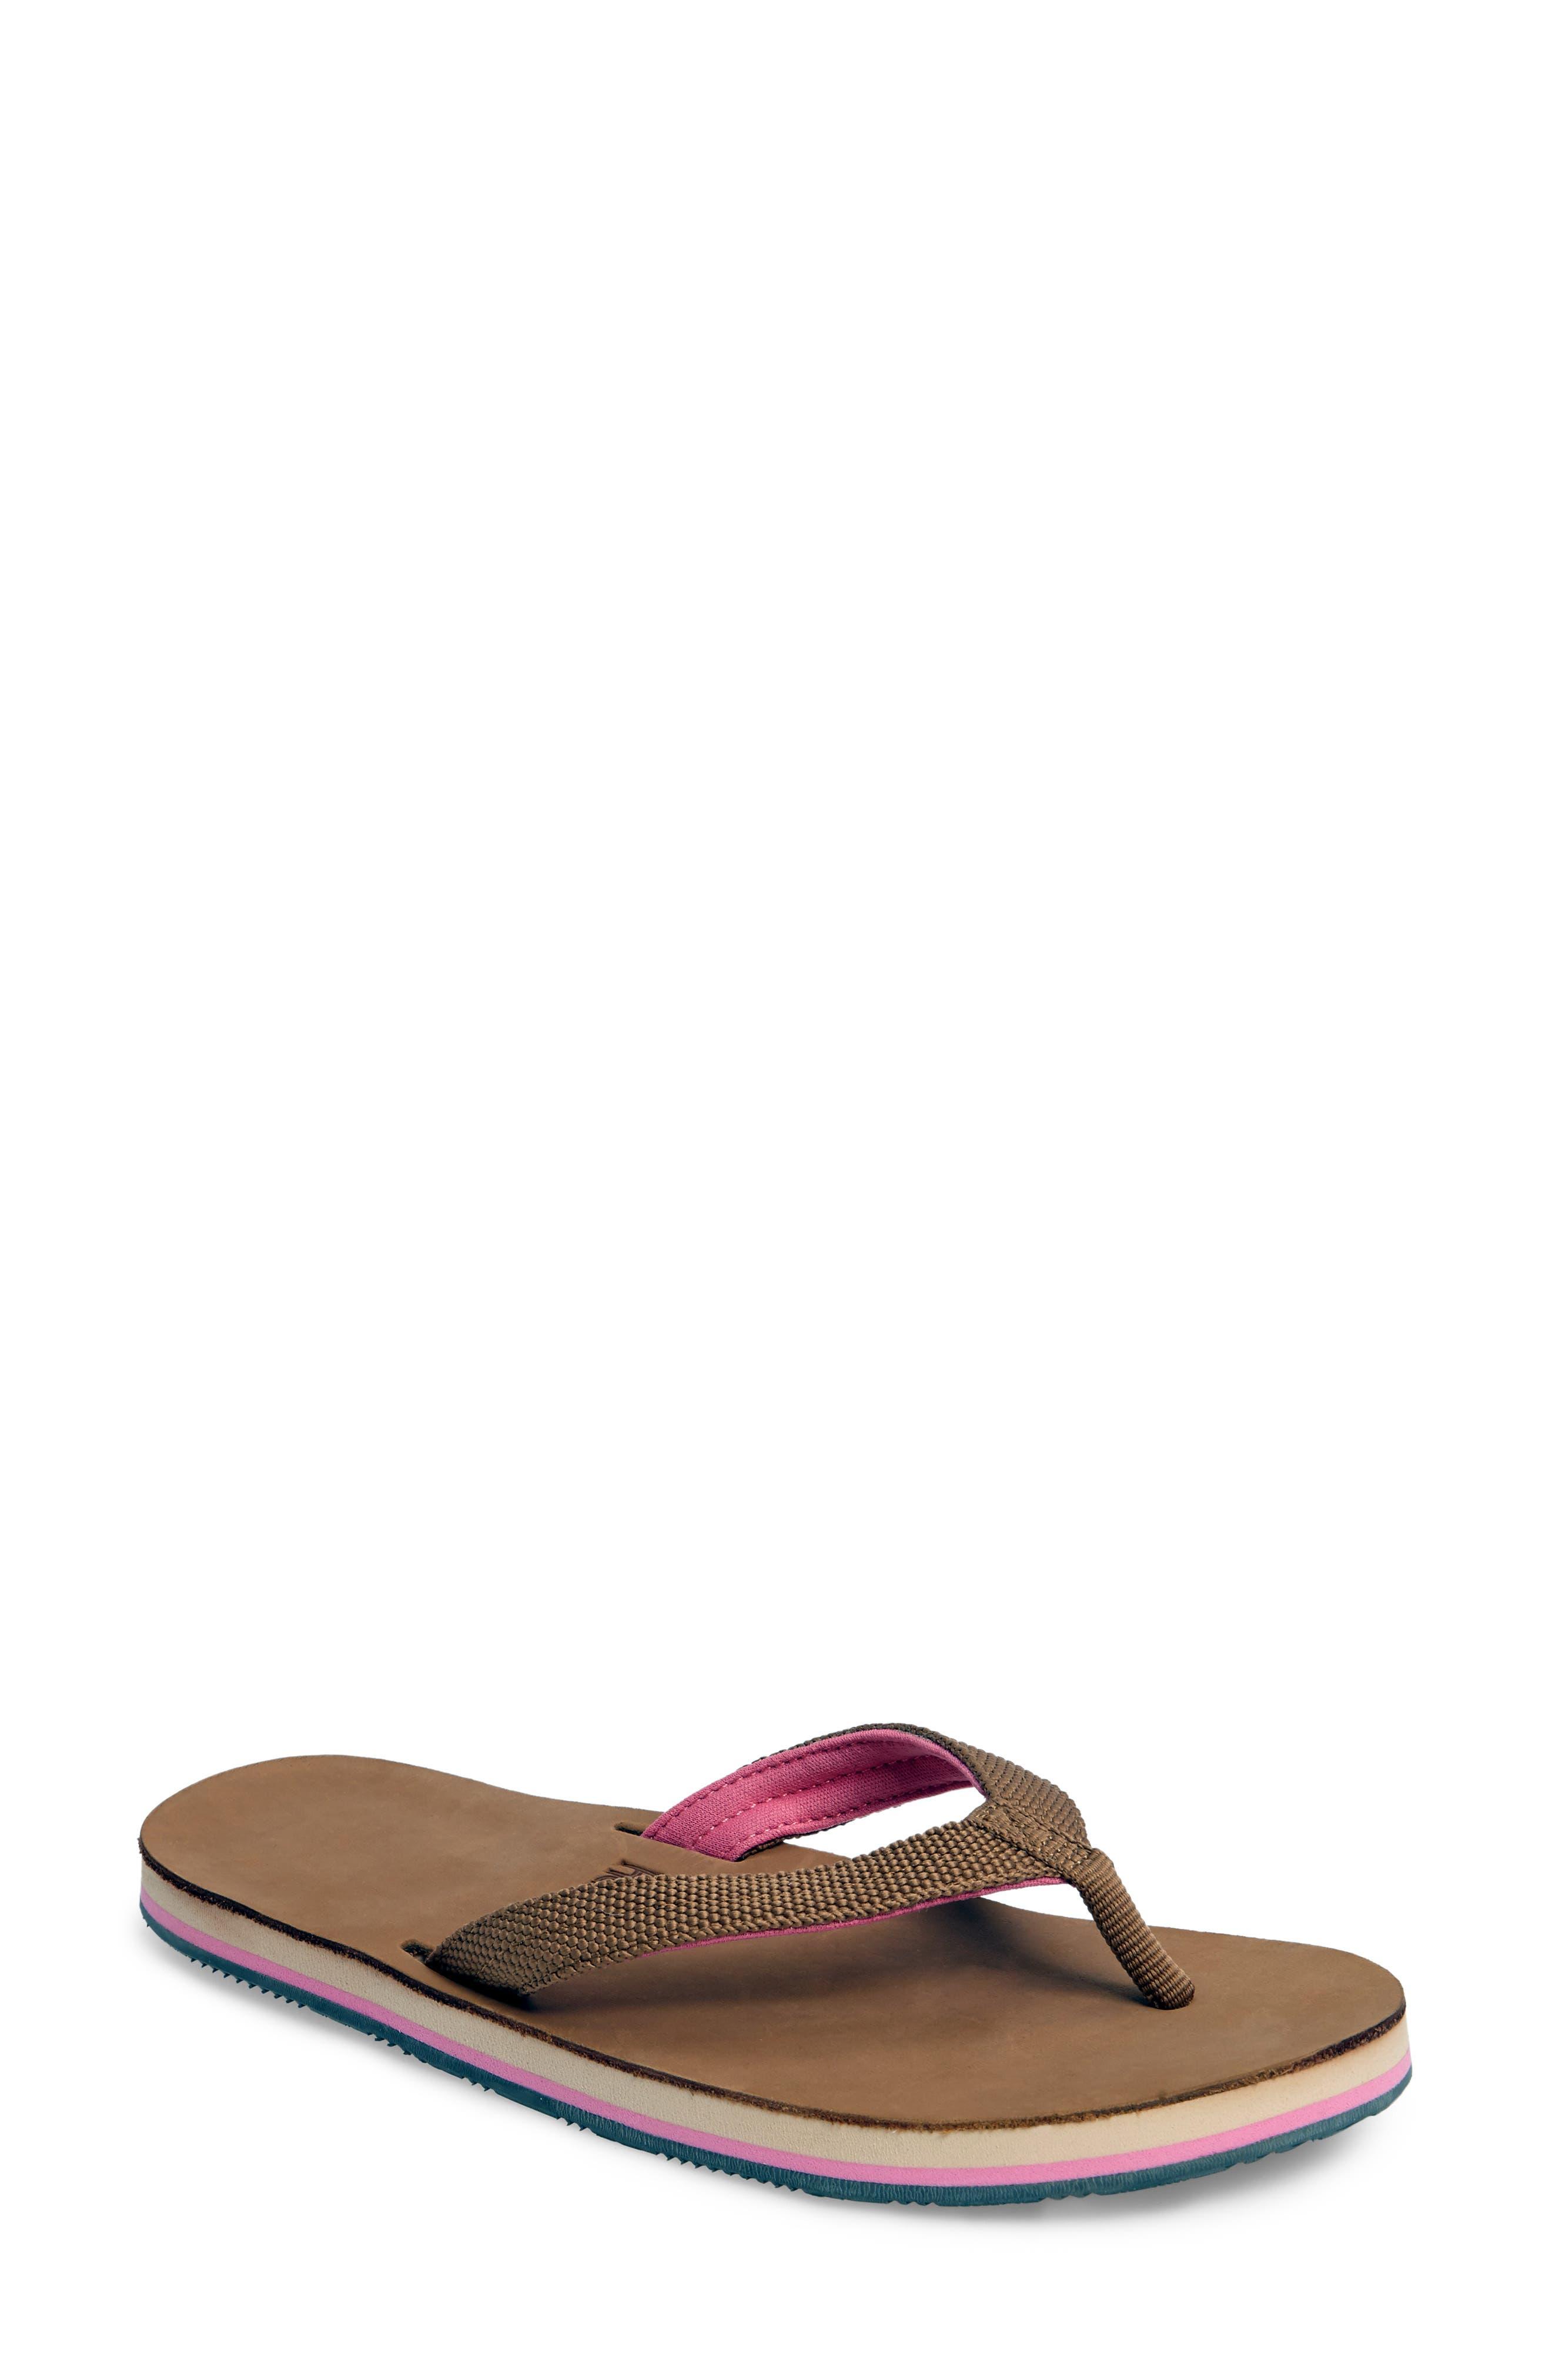 Scouts Flip Flop,                             Main thumbnail 1, color,                             Tan/ Shell Pink